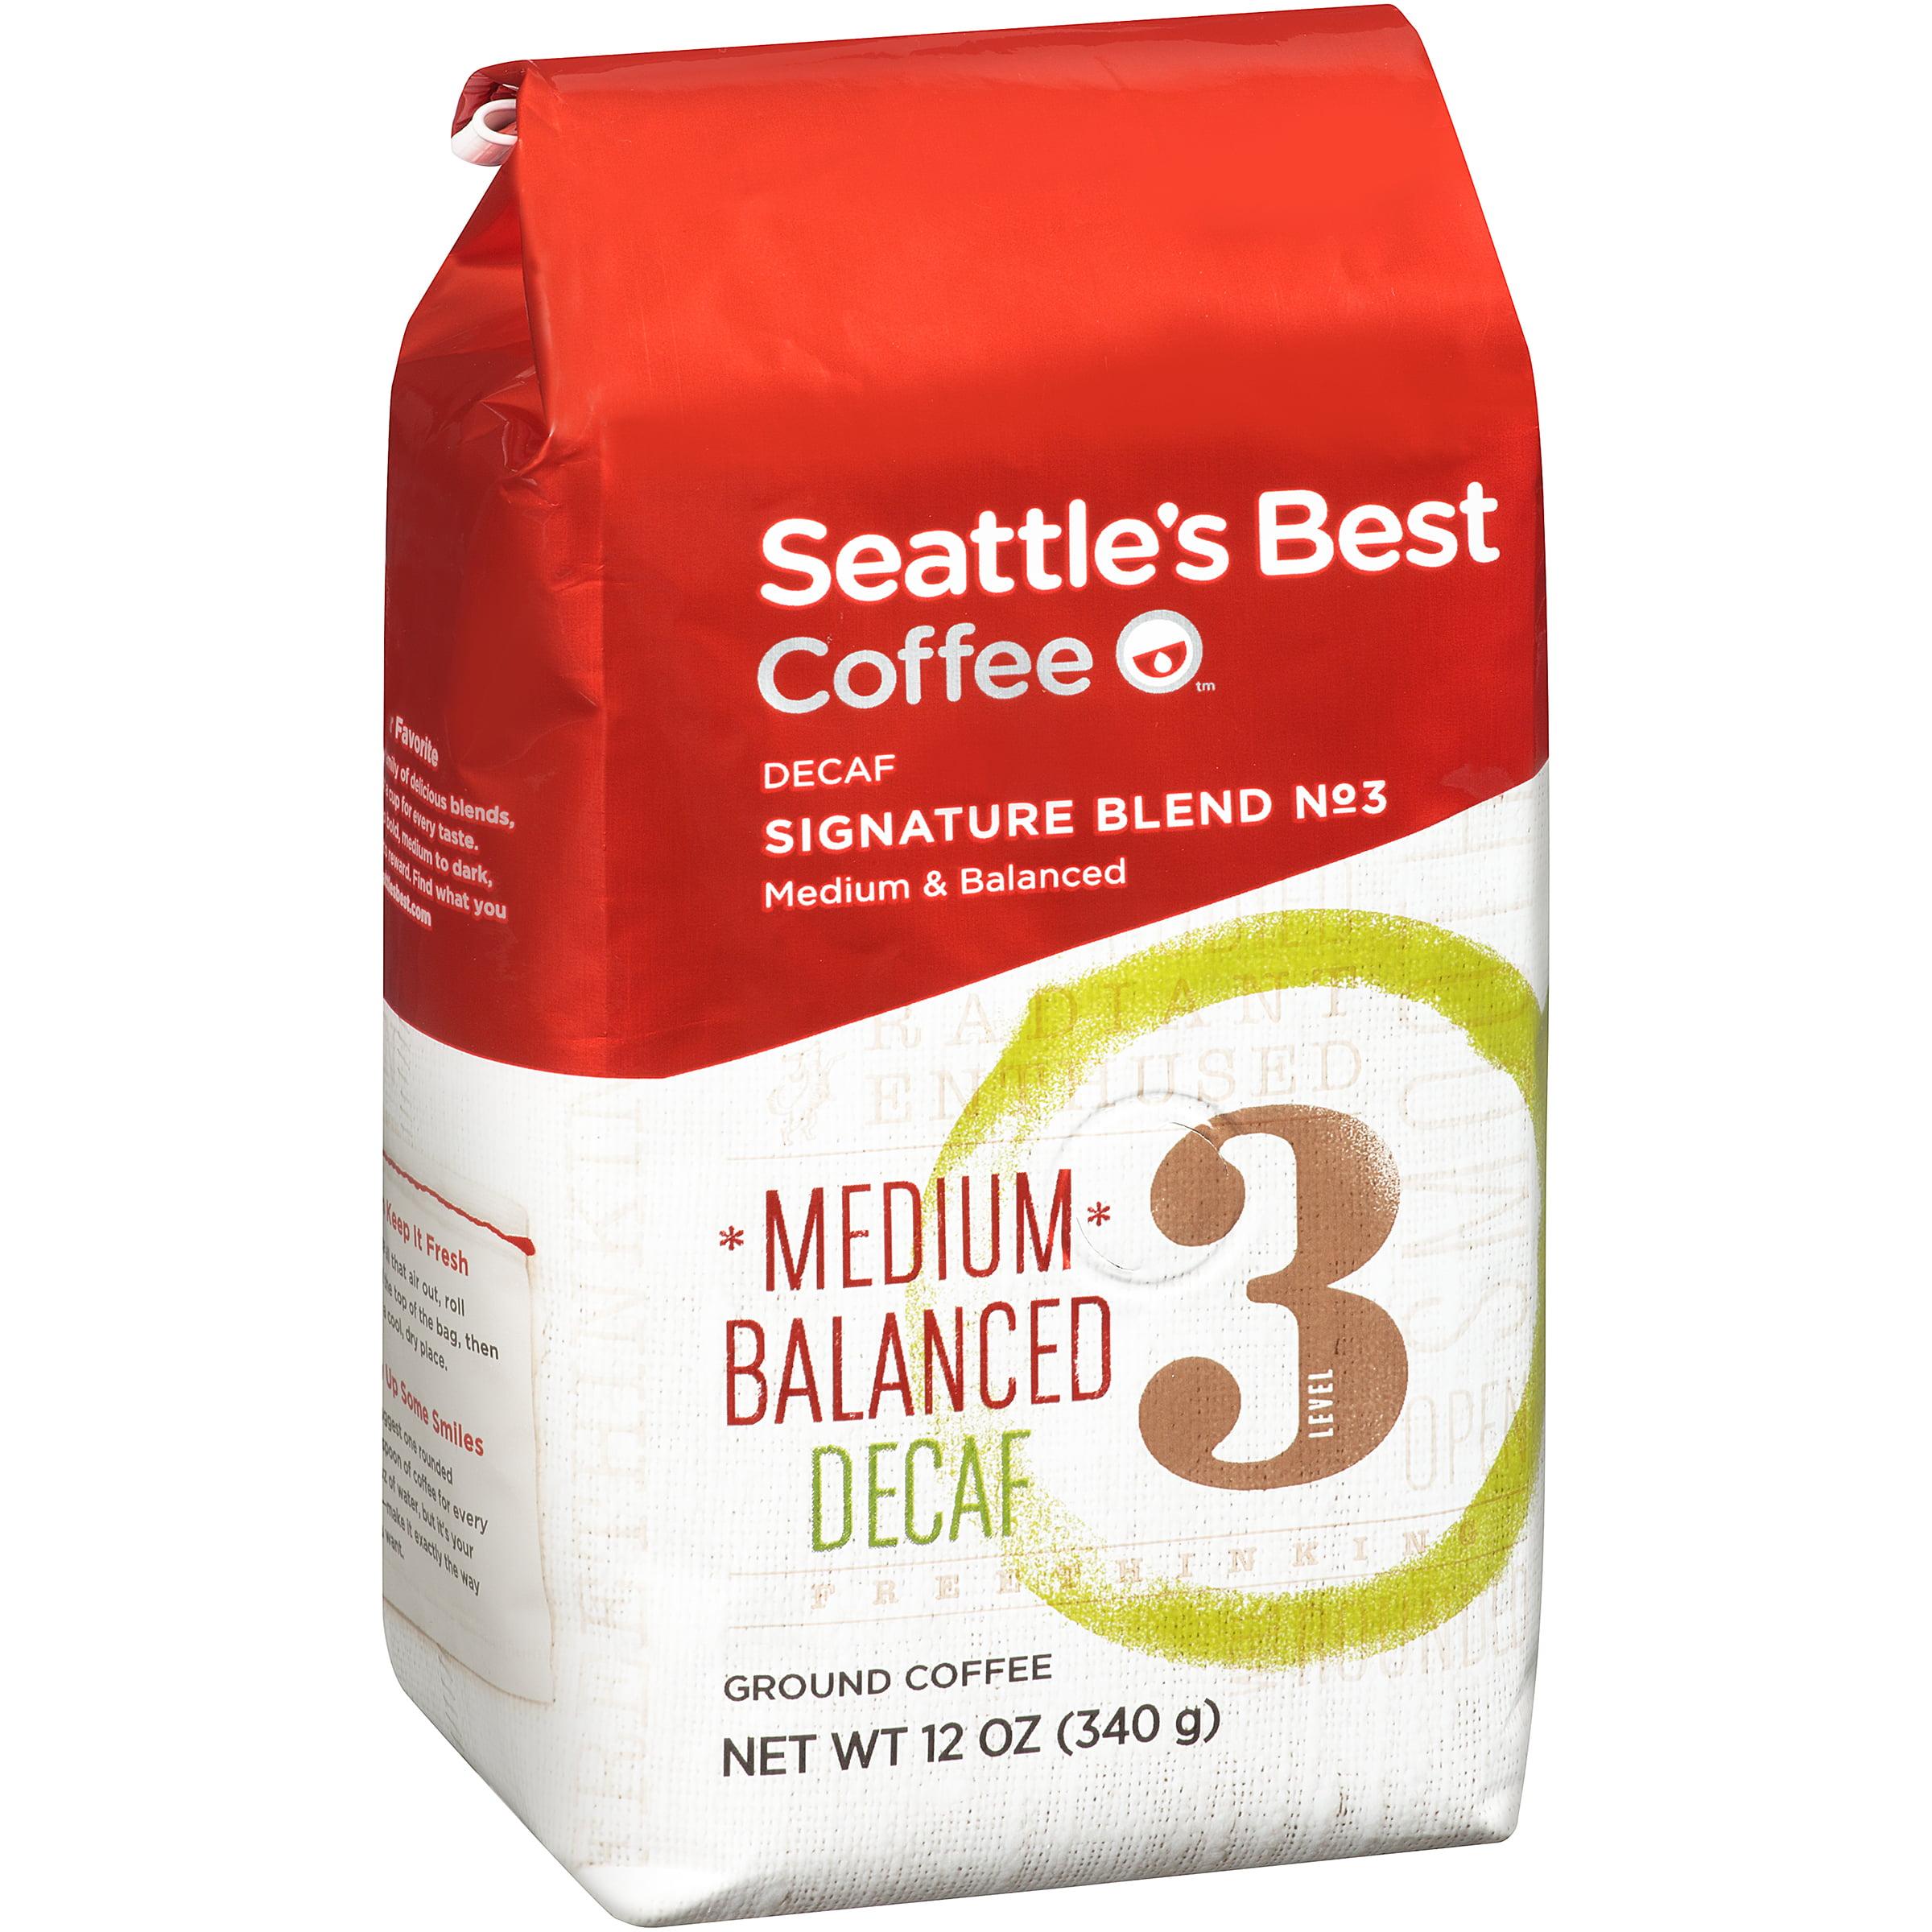 Seattle's Best Coffee��� Medium & Balanced Decaf Signature Blend No. 3 Ground Coffee 12 oz. Bag